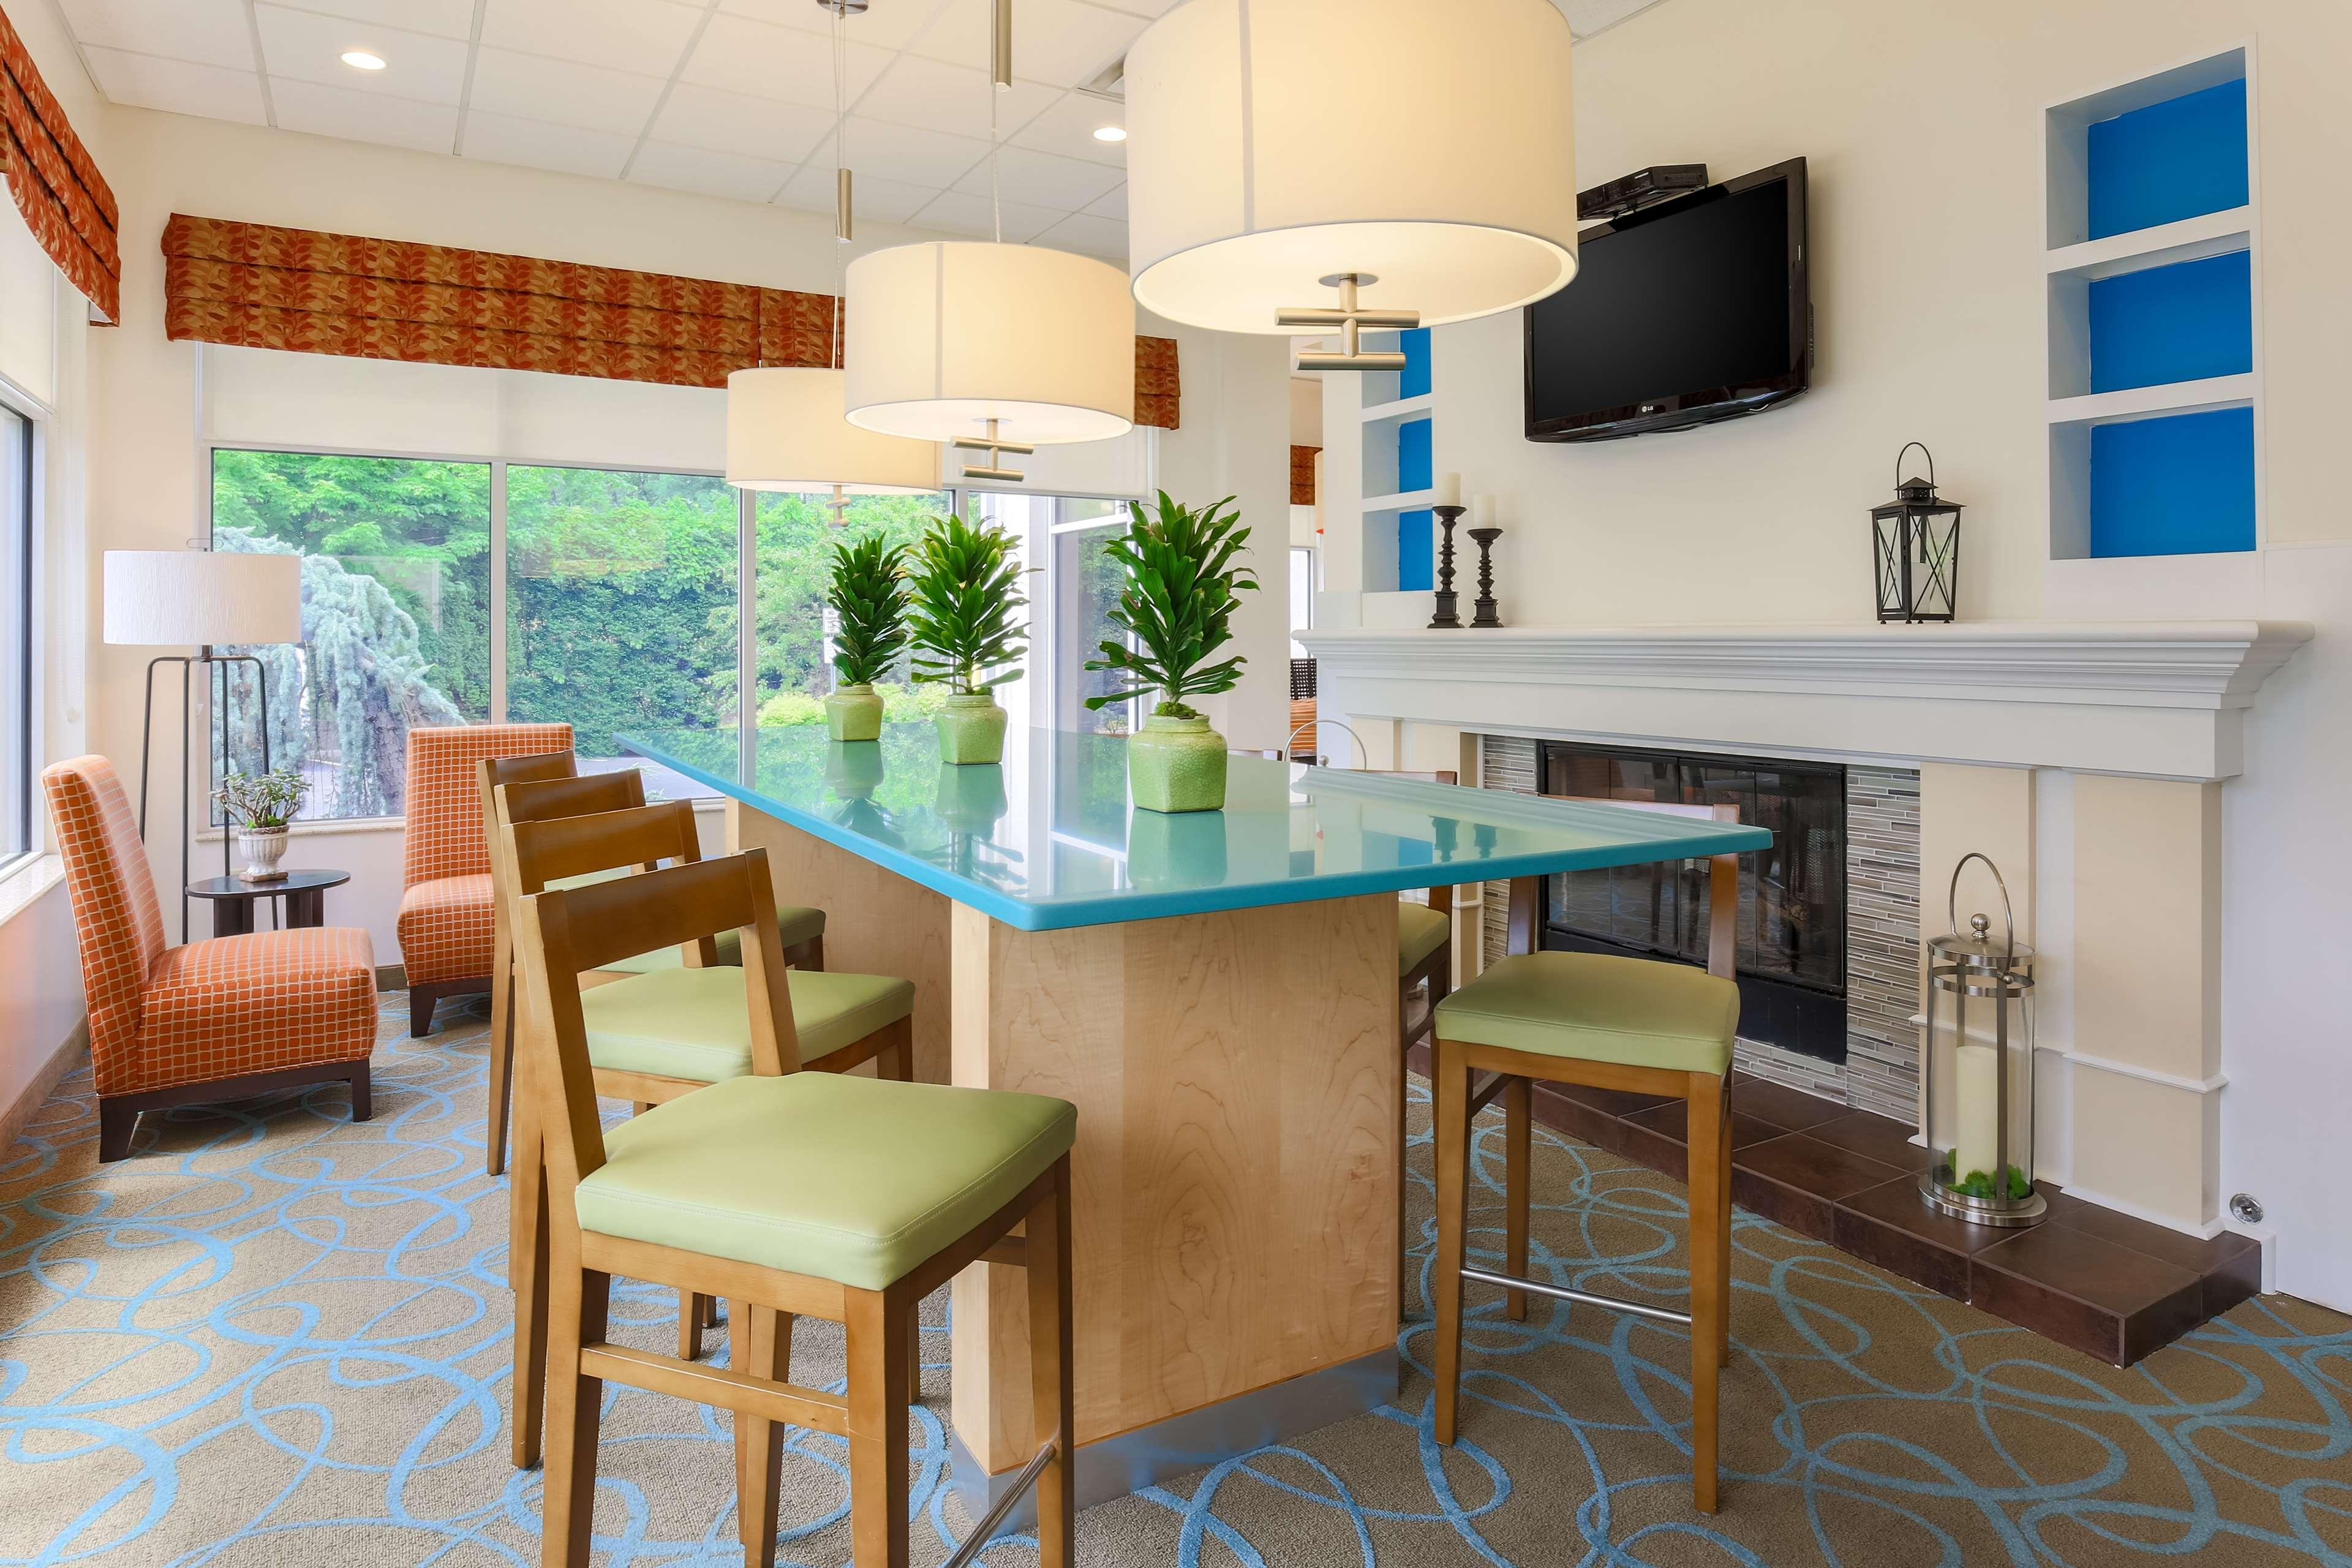 Hilton Garden Inn Nanuet image 3